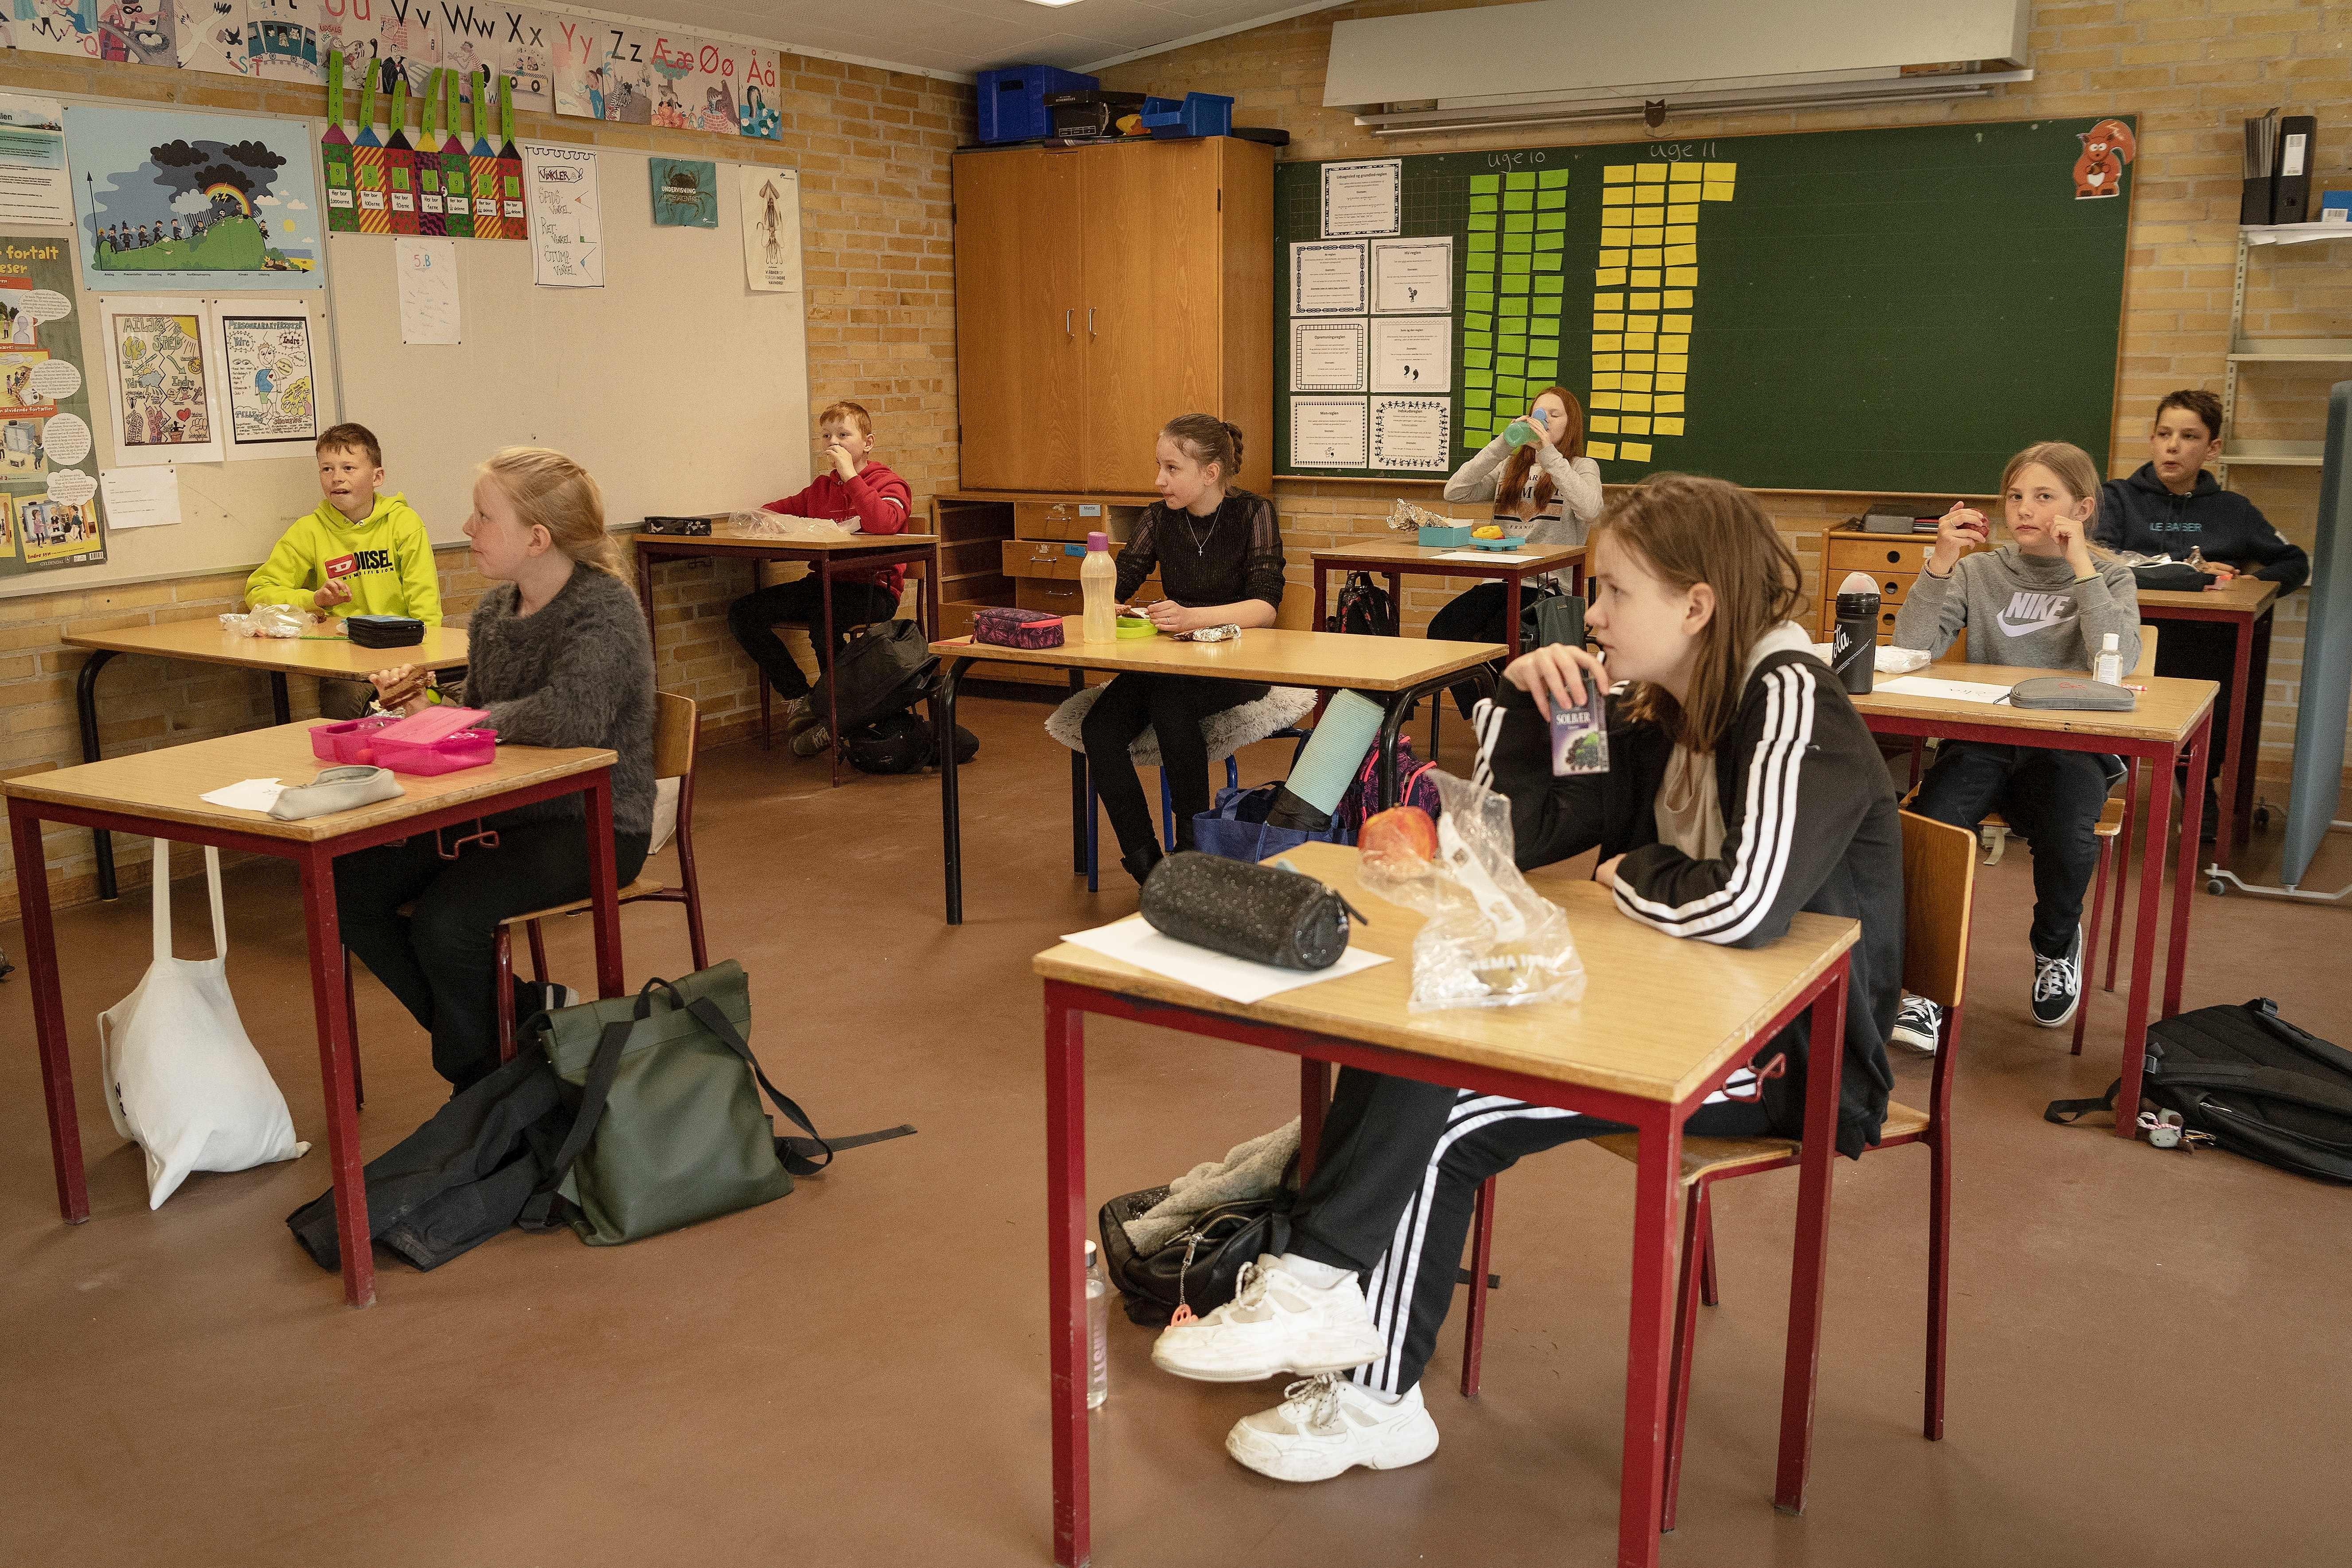 Group Of Kids Talking In Class